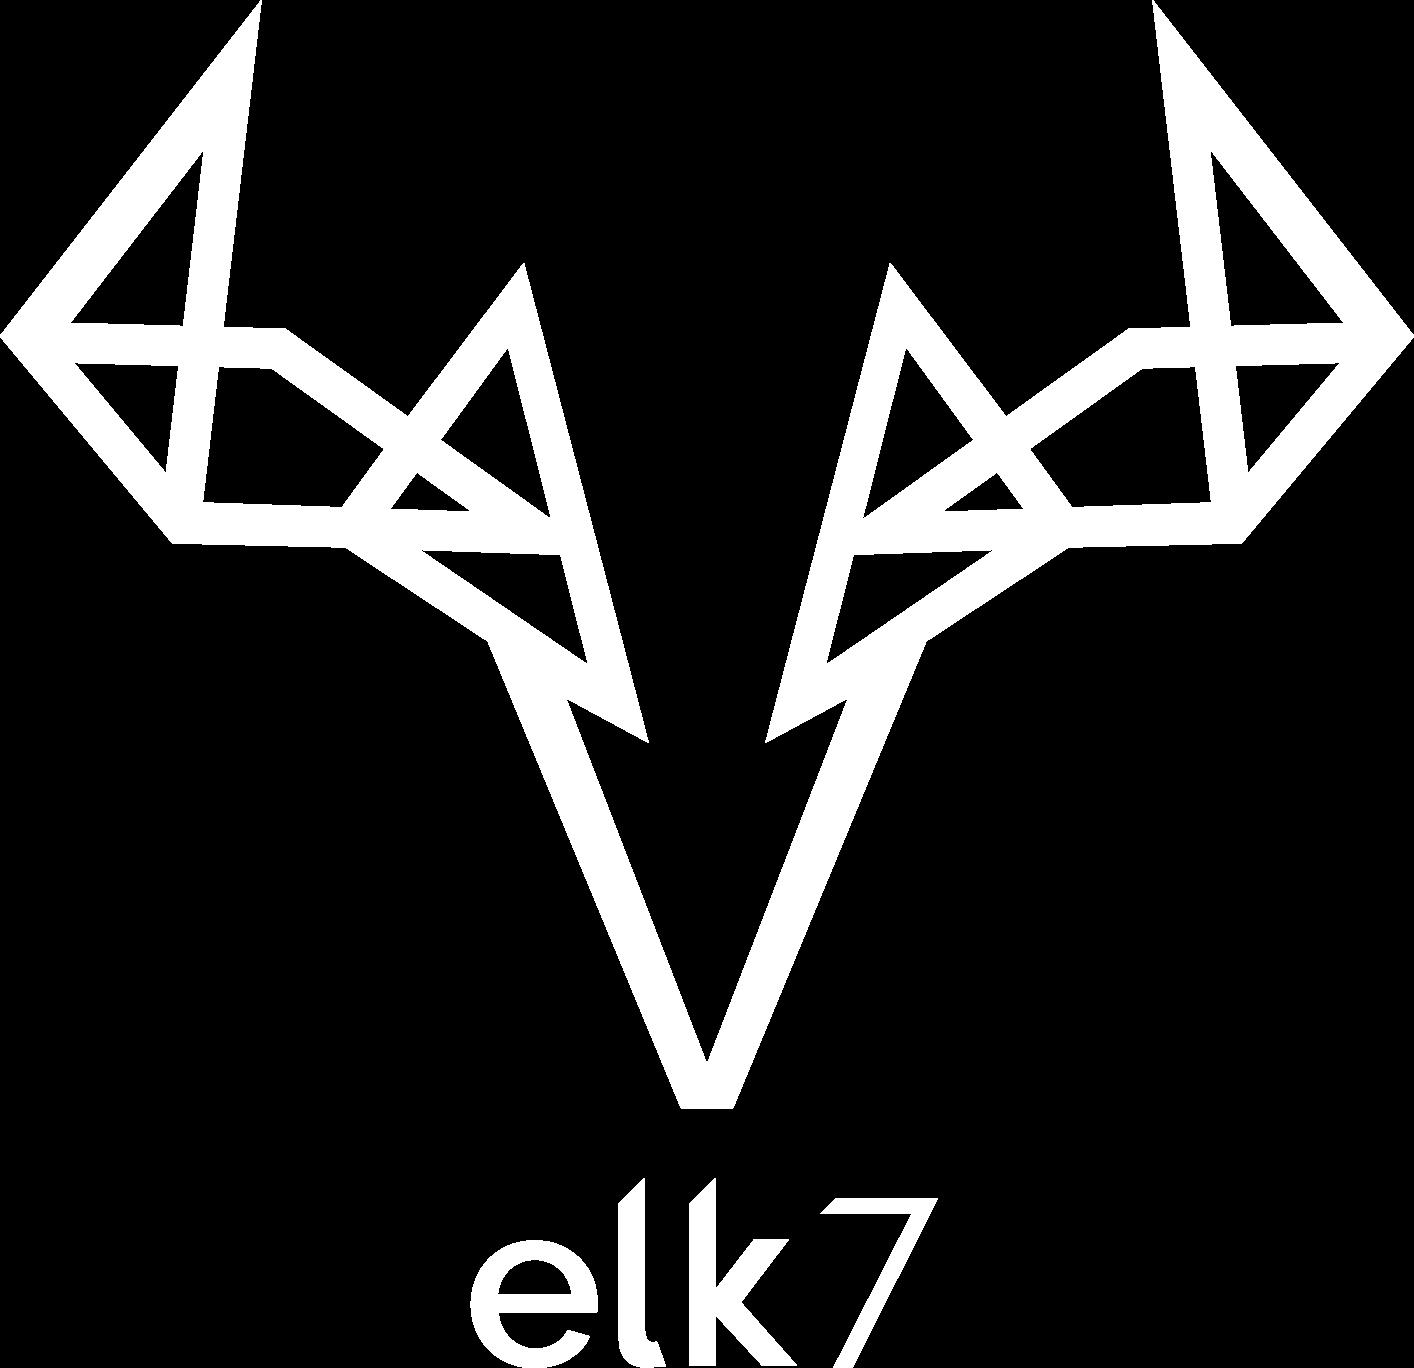 Per the elk corp contest